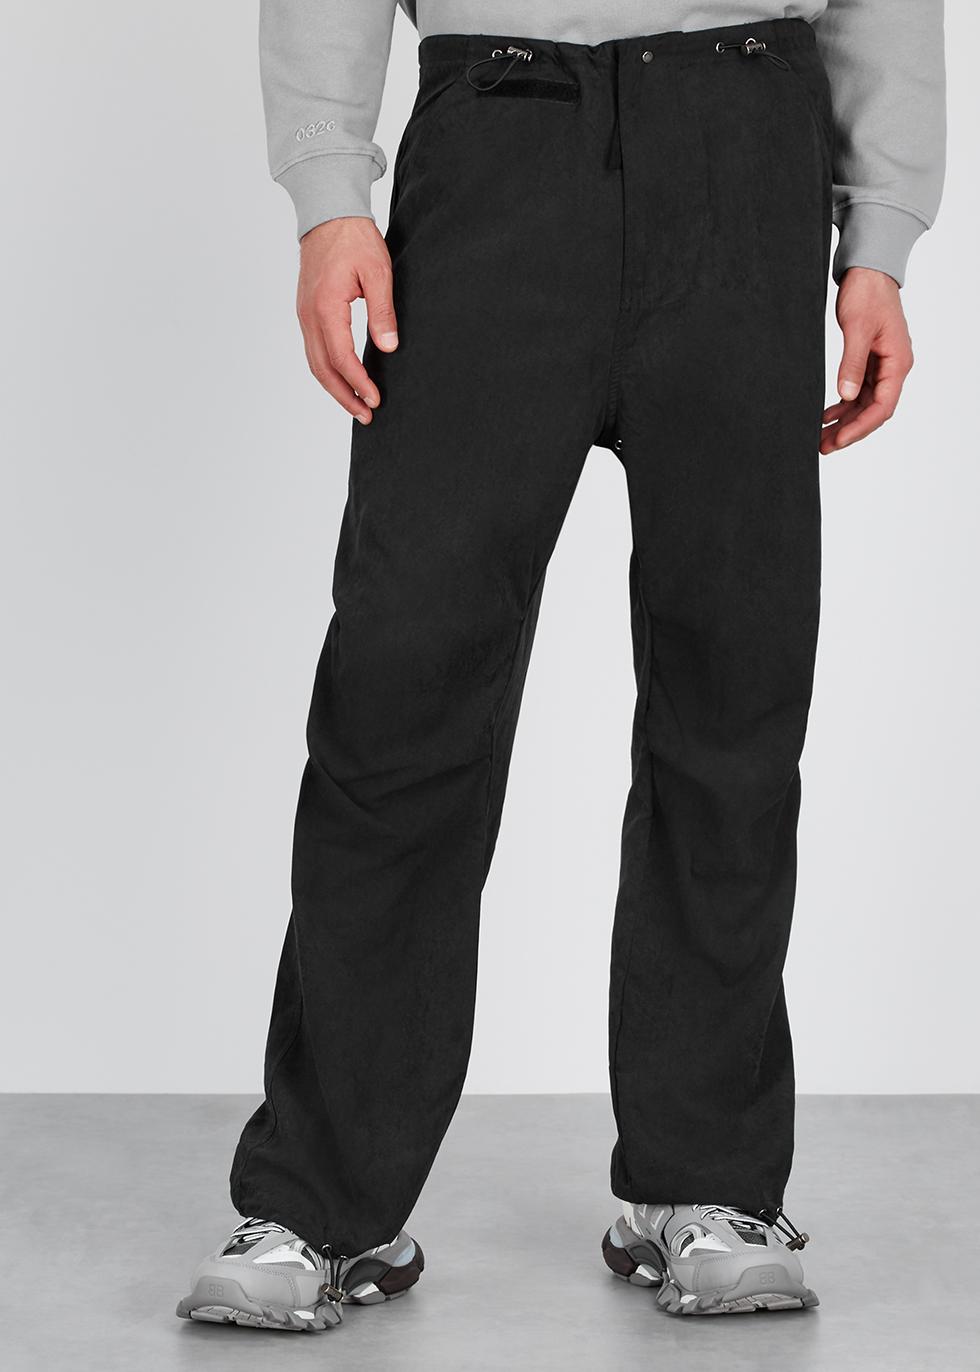 Rave black trousers - 032c